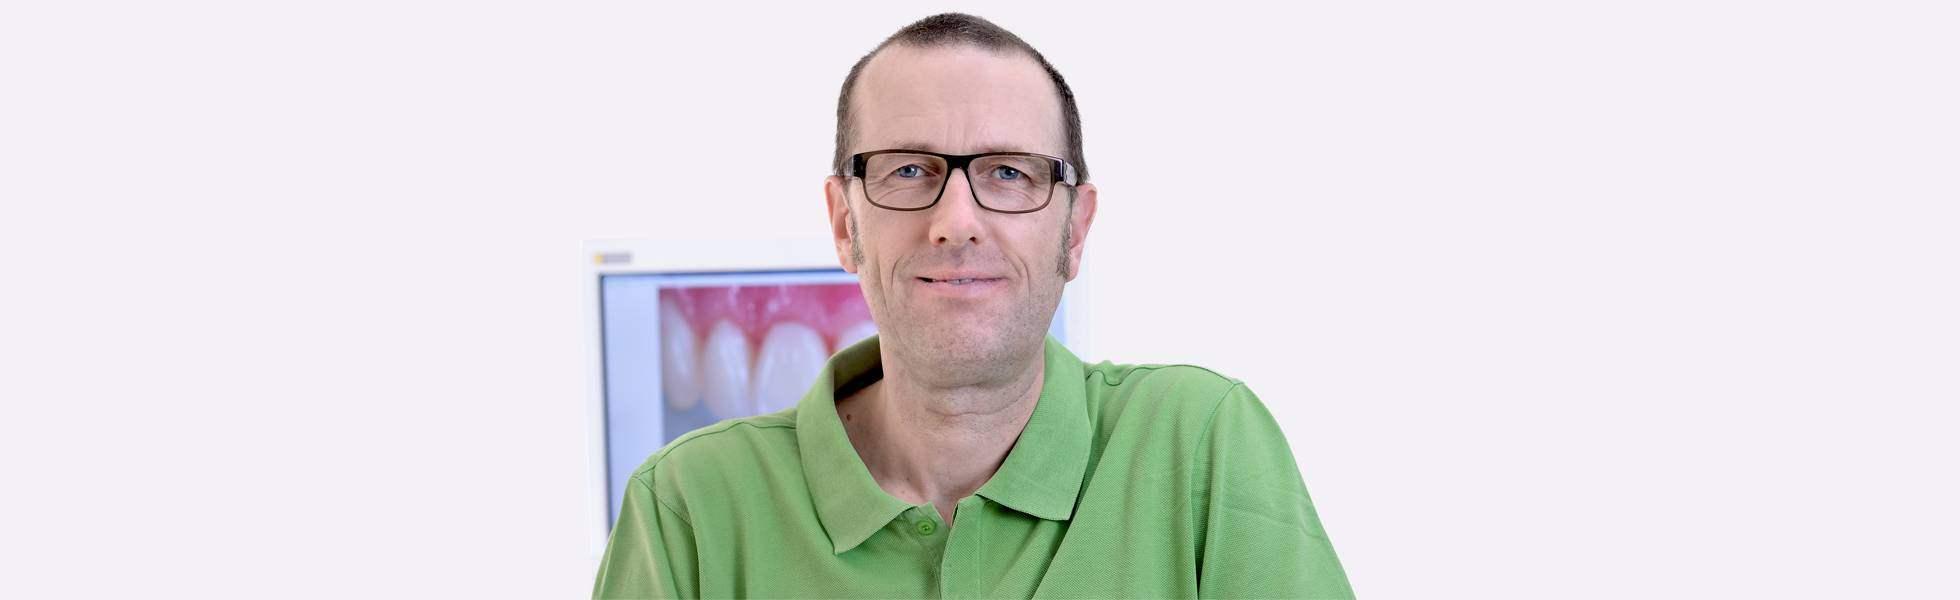 Zahnarzt Stefan Mewes Portaitaufnahme